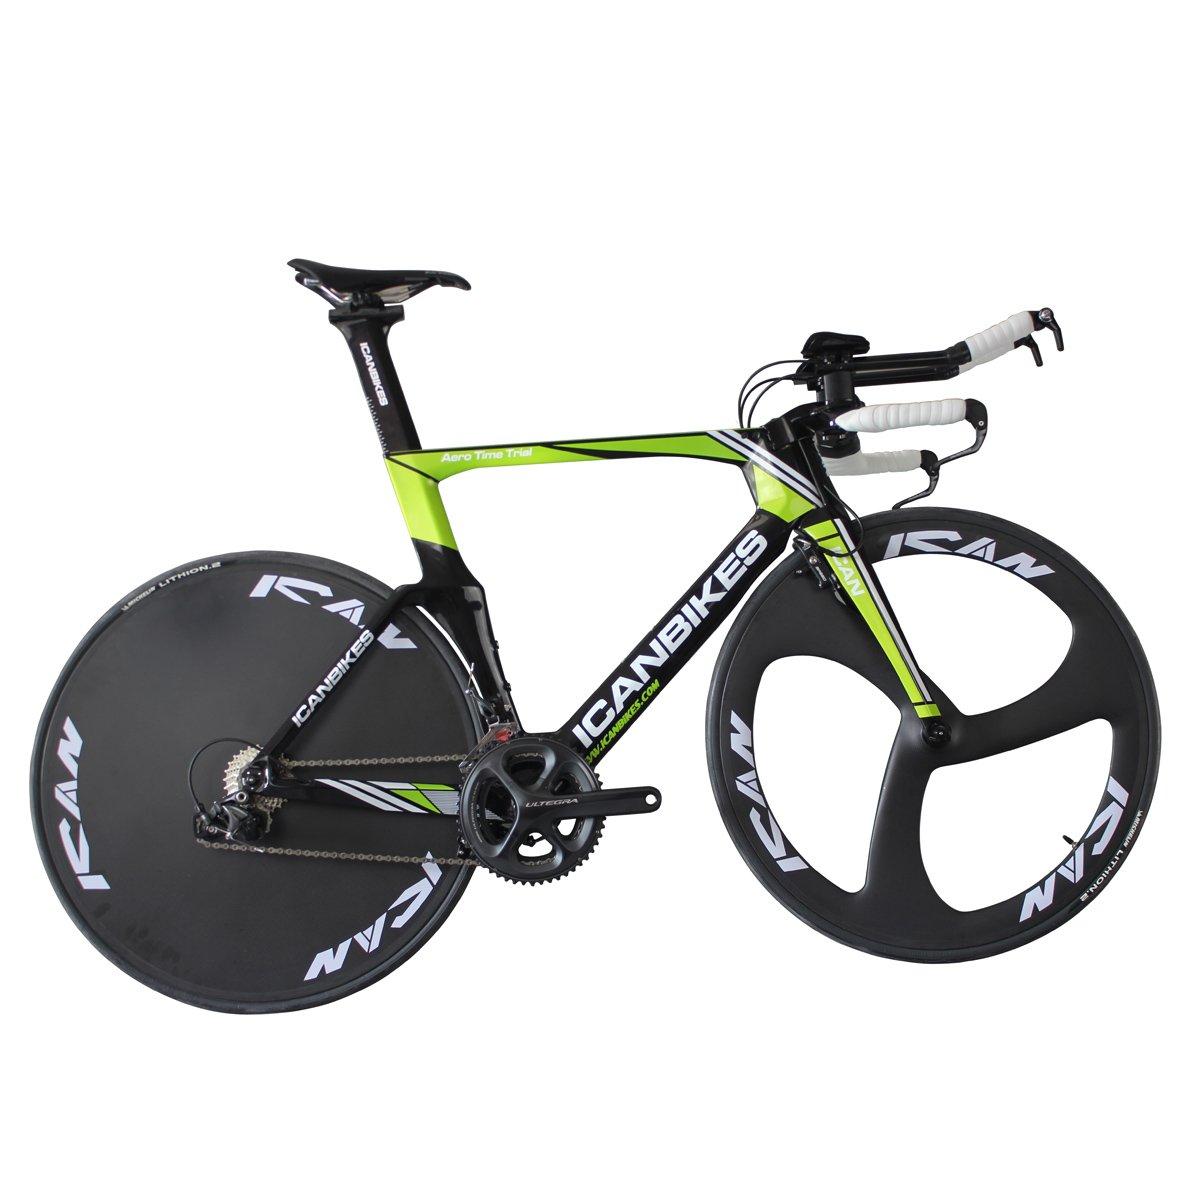 ICAN(アイカン) Arrow X フルカーボン 競輪バイクTT01 シマノUltegra 6800 トラックバイク 53.5/55.5/57.5cmサイズのタイムトライアルバイク B01AT2QLXI